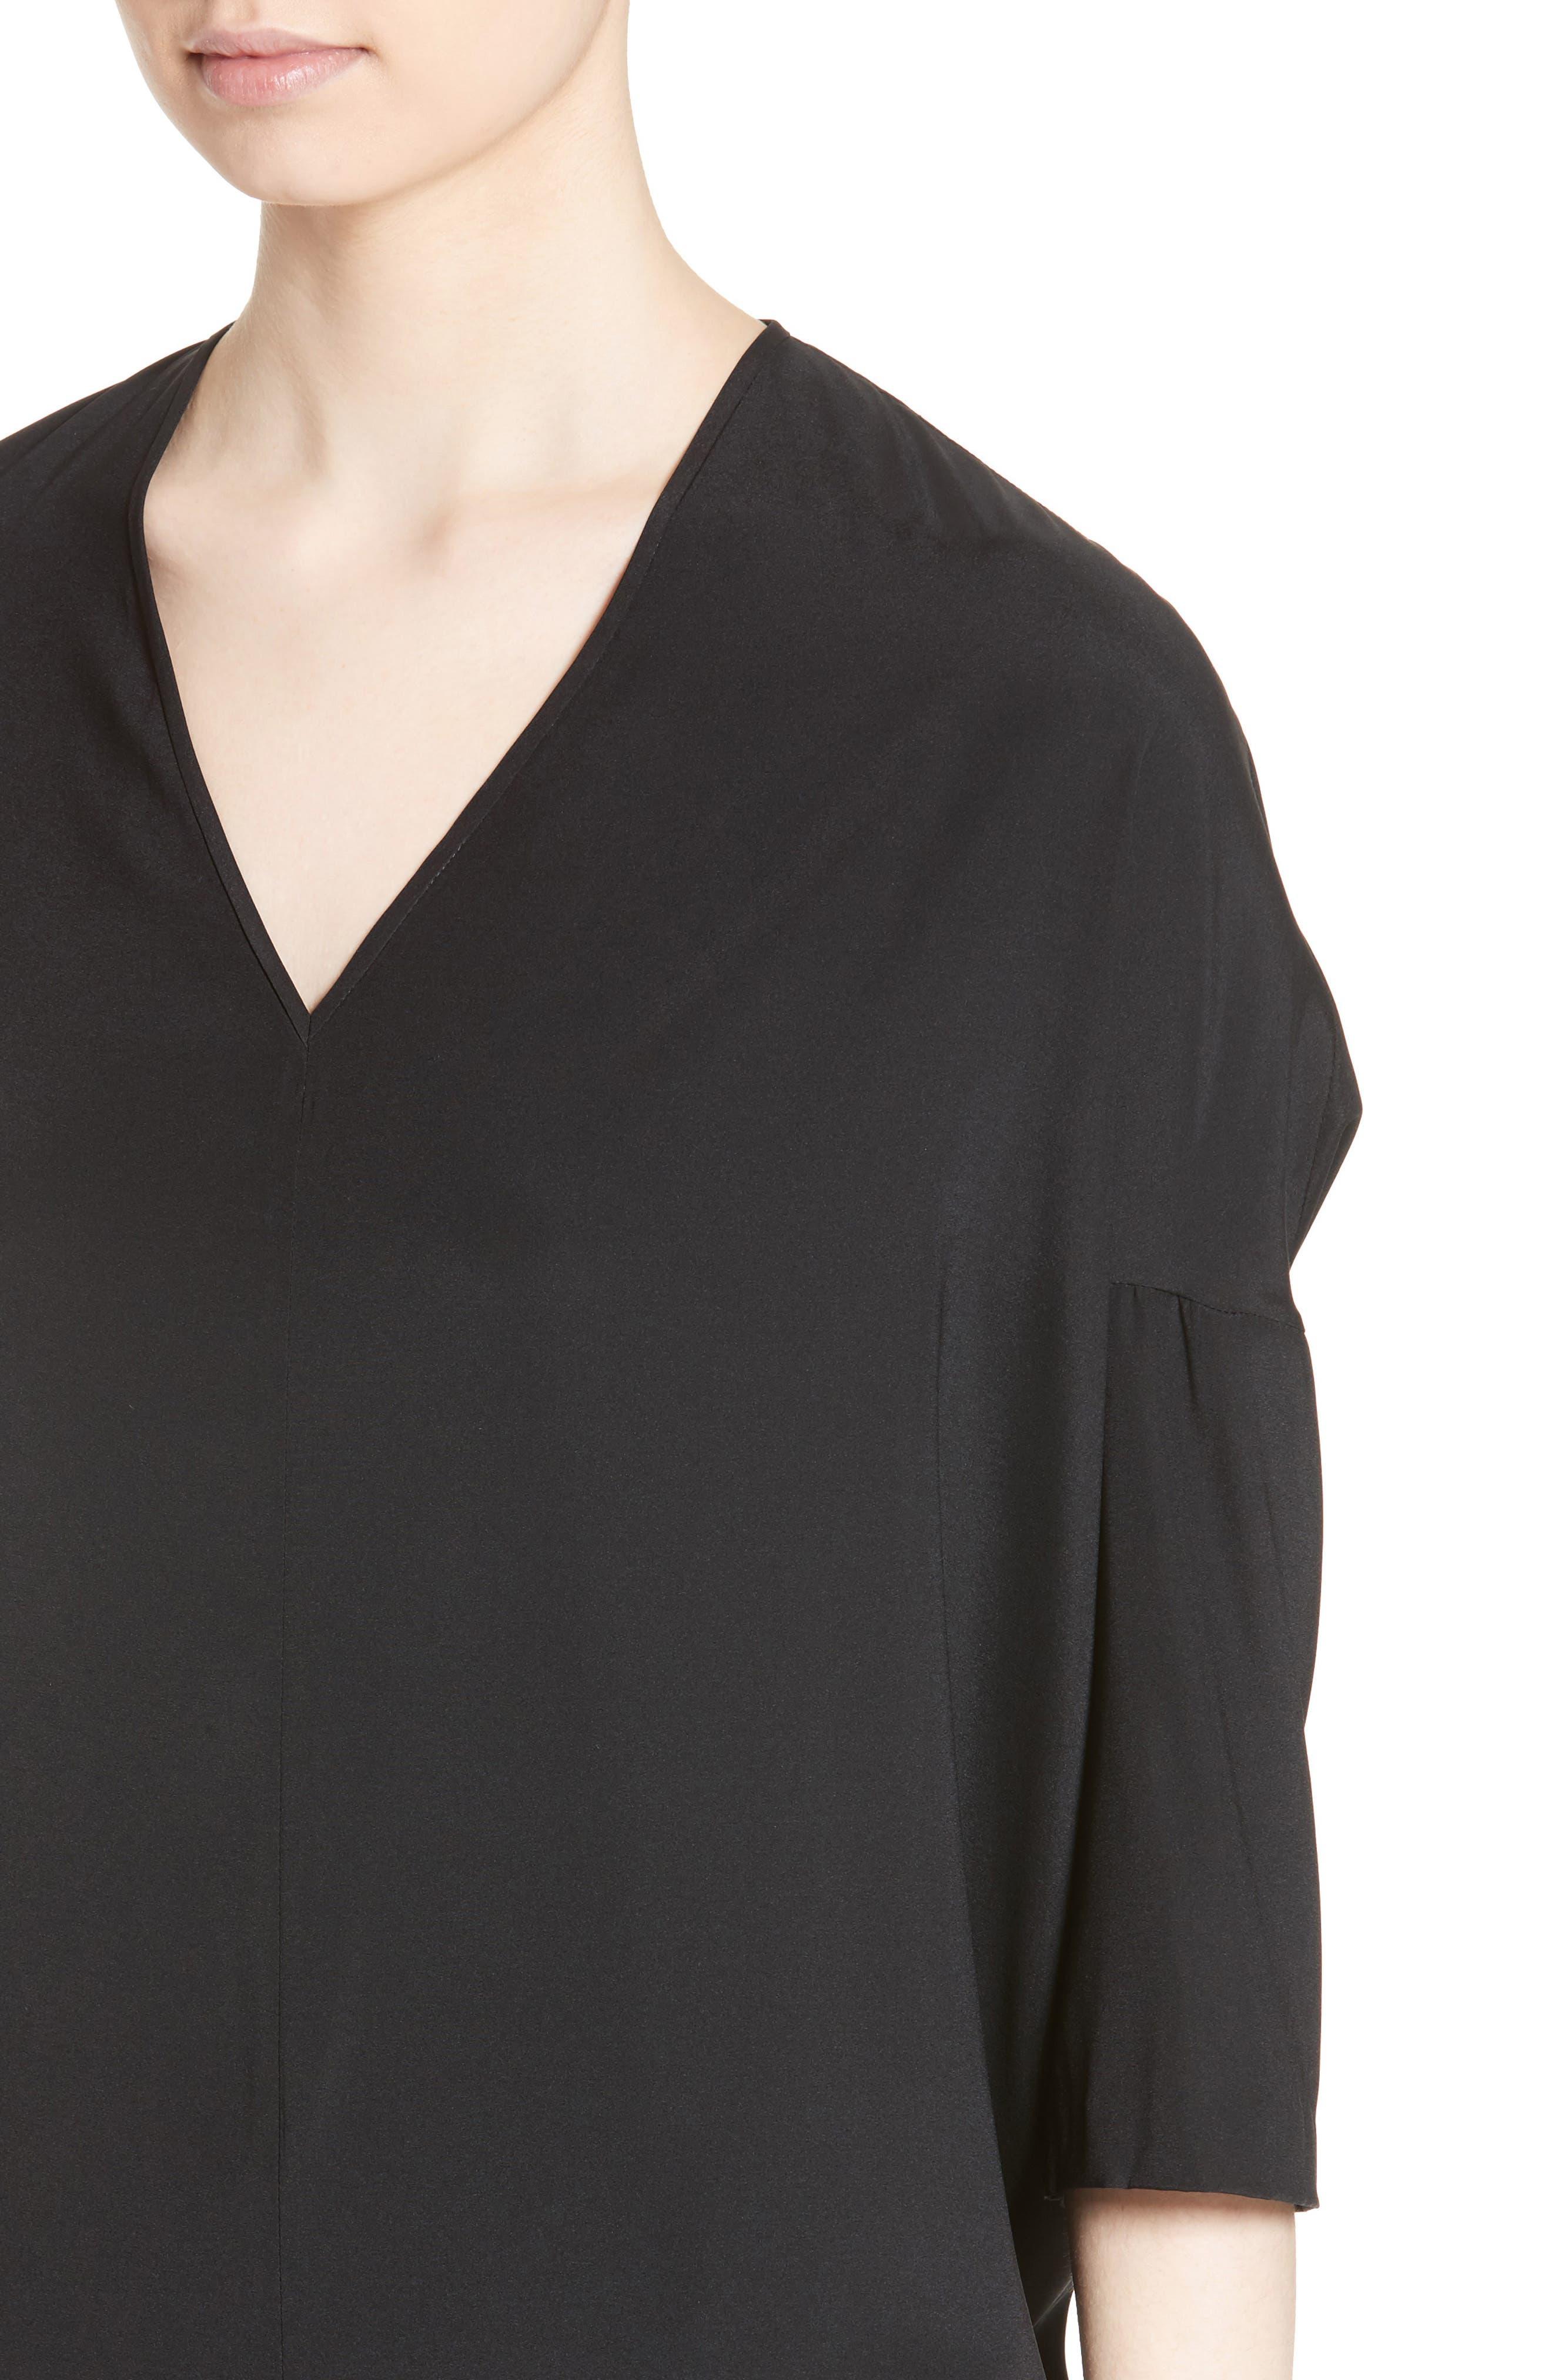 Koya Stretch Silk Charmeuse Dress,                             Alternate thumbnail 4, color,                             001